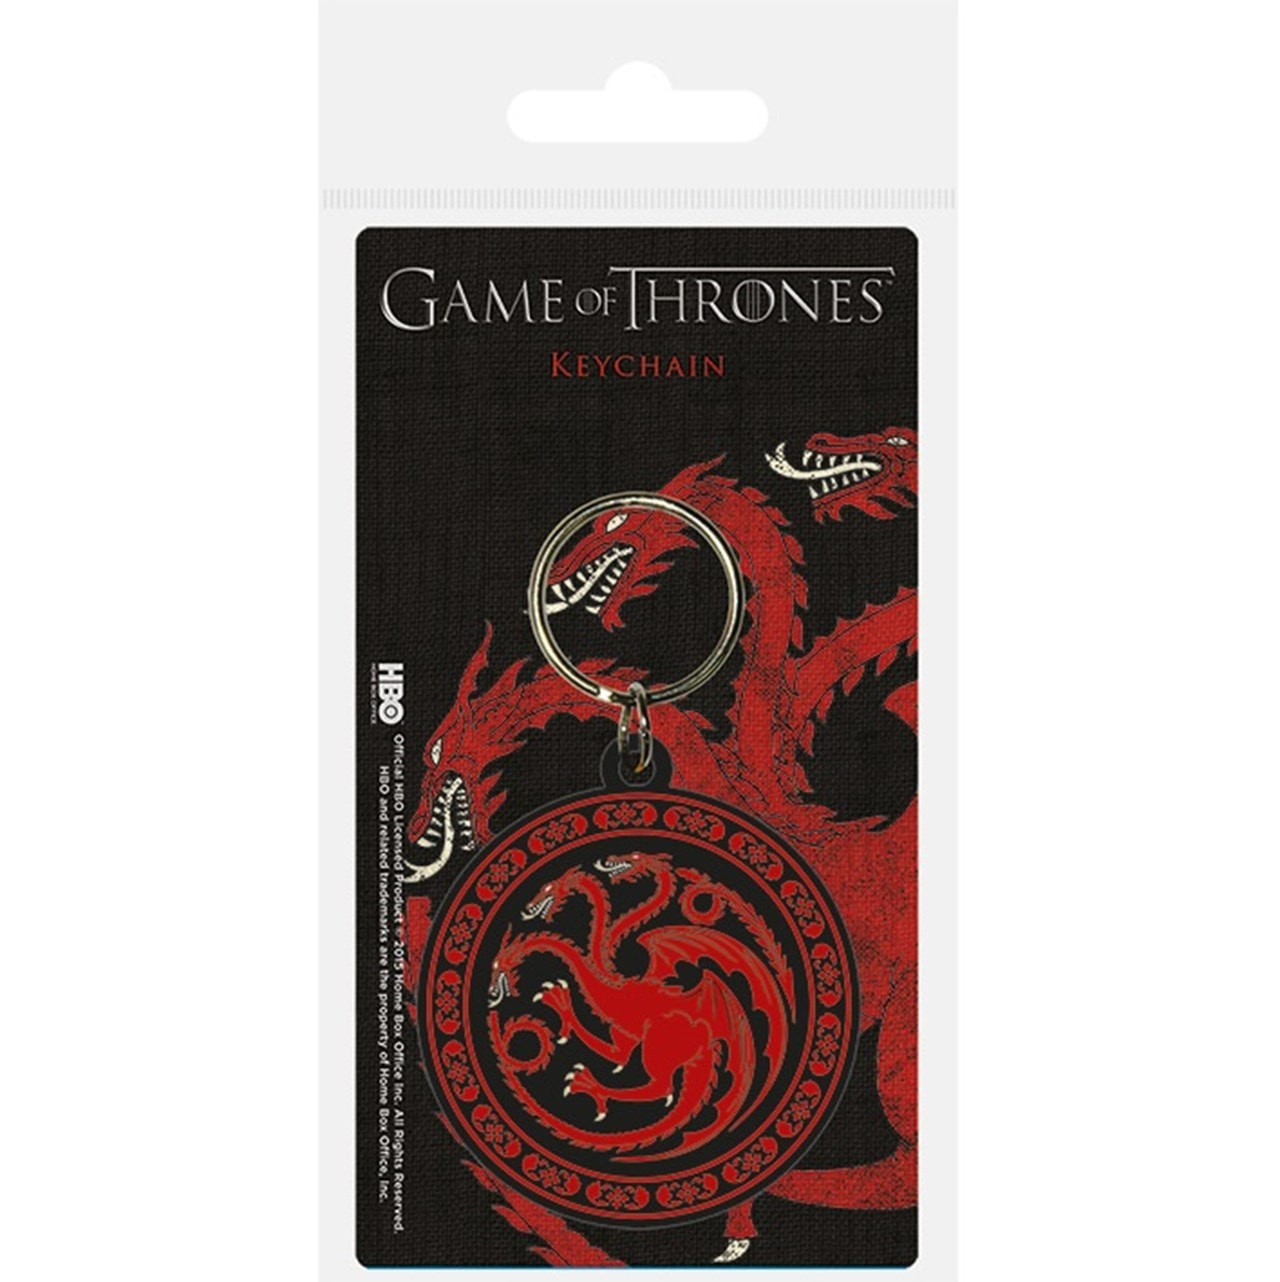 Game of Thrones: Targaryen Keychain - 1